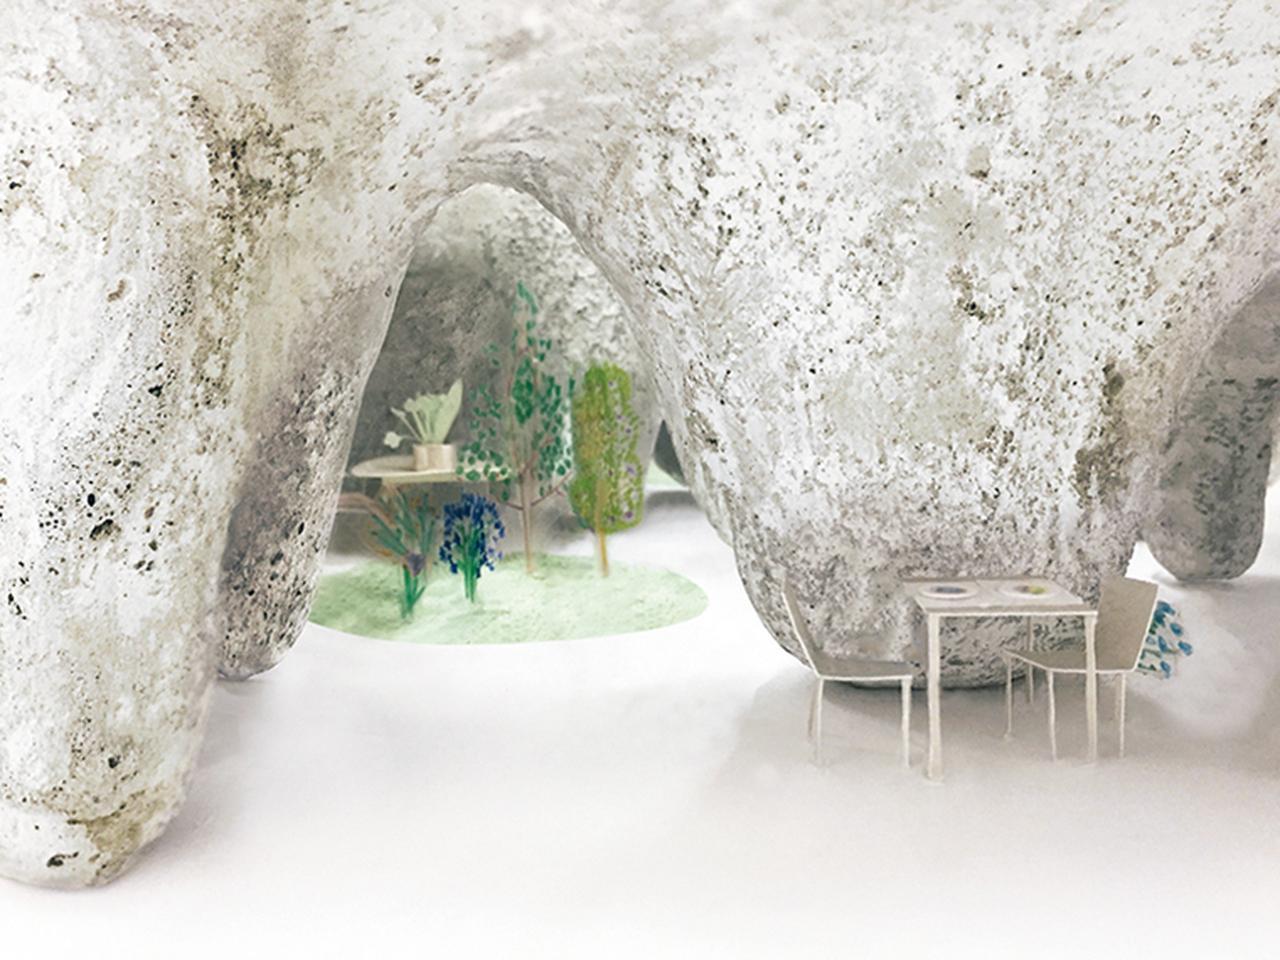 Images : 4番目の画像 - 「建築界、アート界が注目する 石上純也の個展が、  カルティエ現代美術財団で開催」のアルバム - T JAPAN:The New York Times Style Magazine 公式サイト